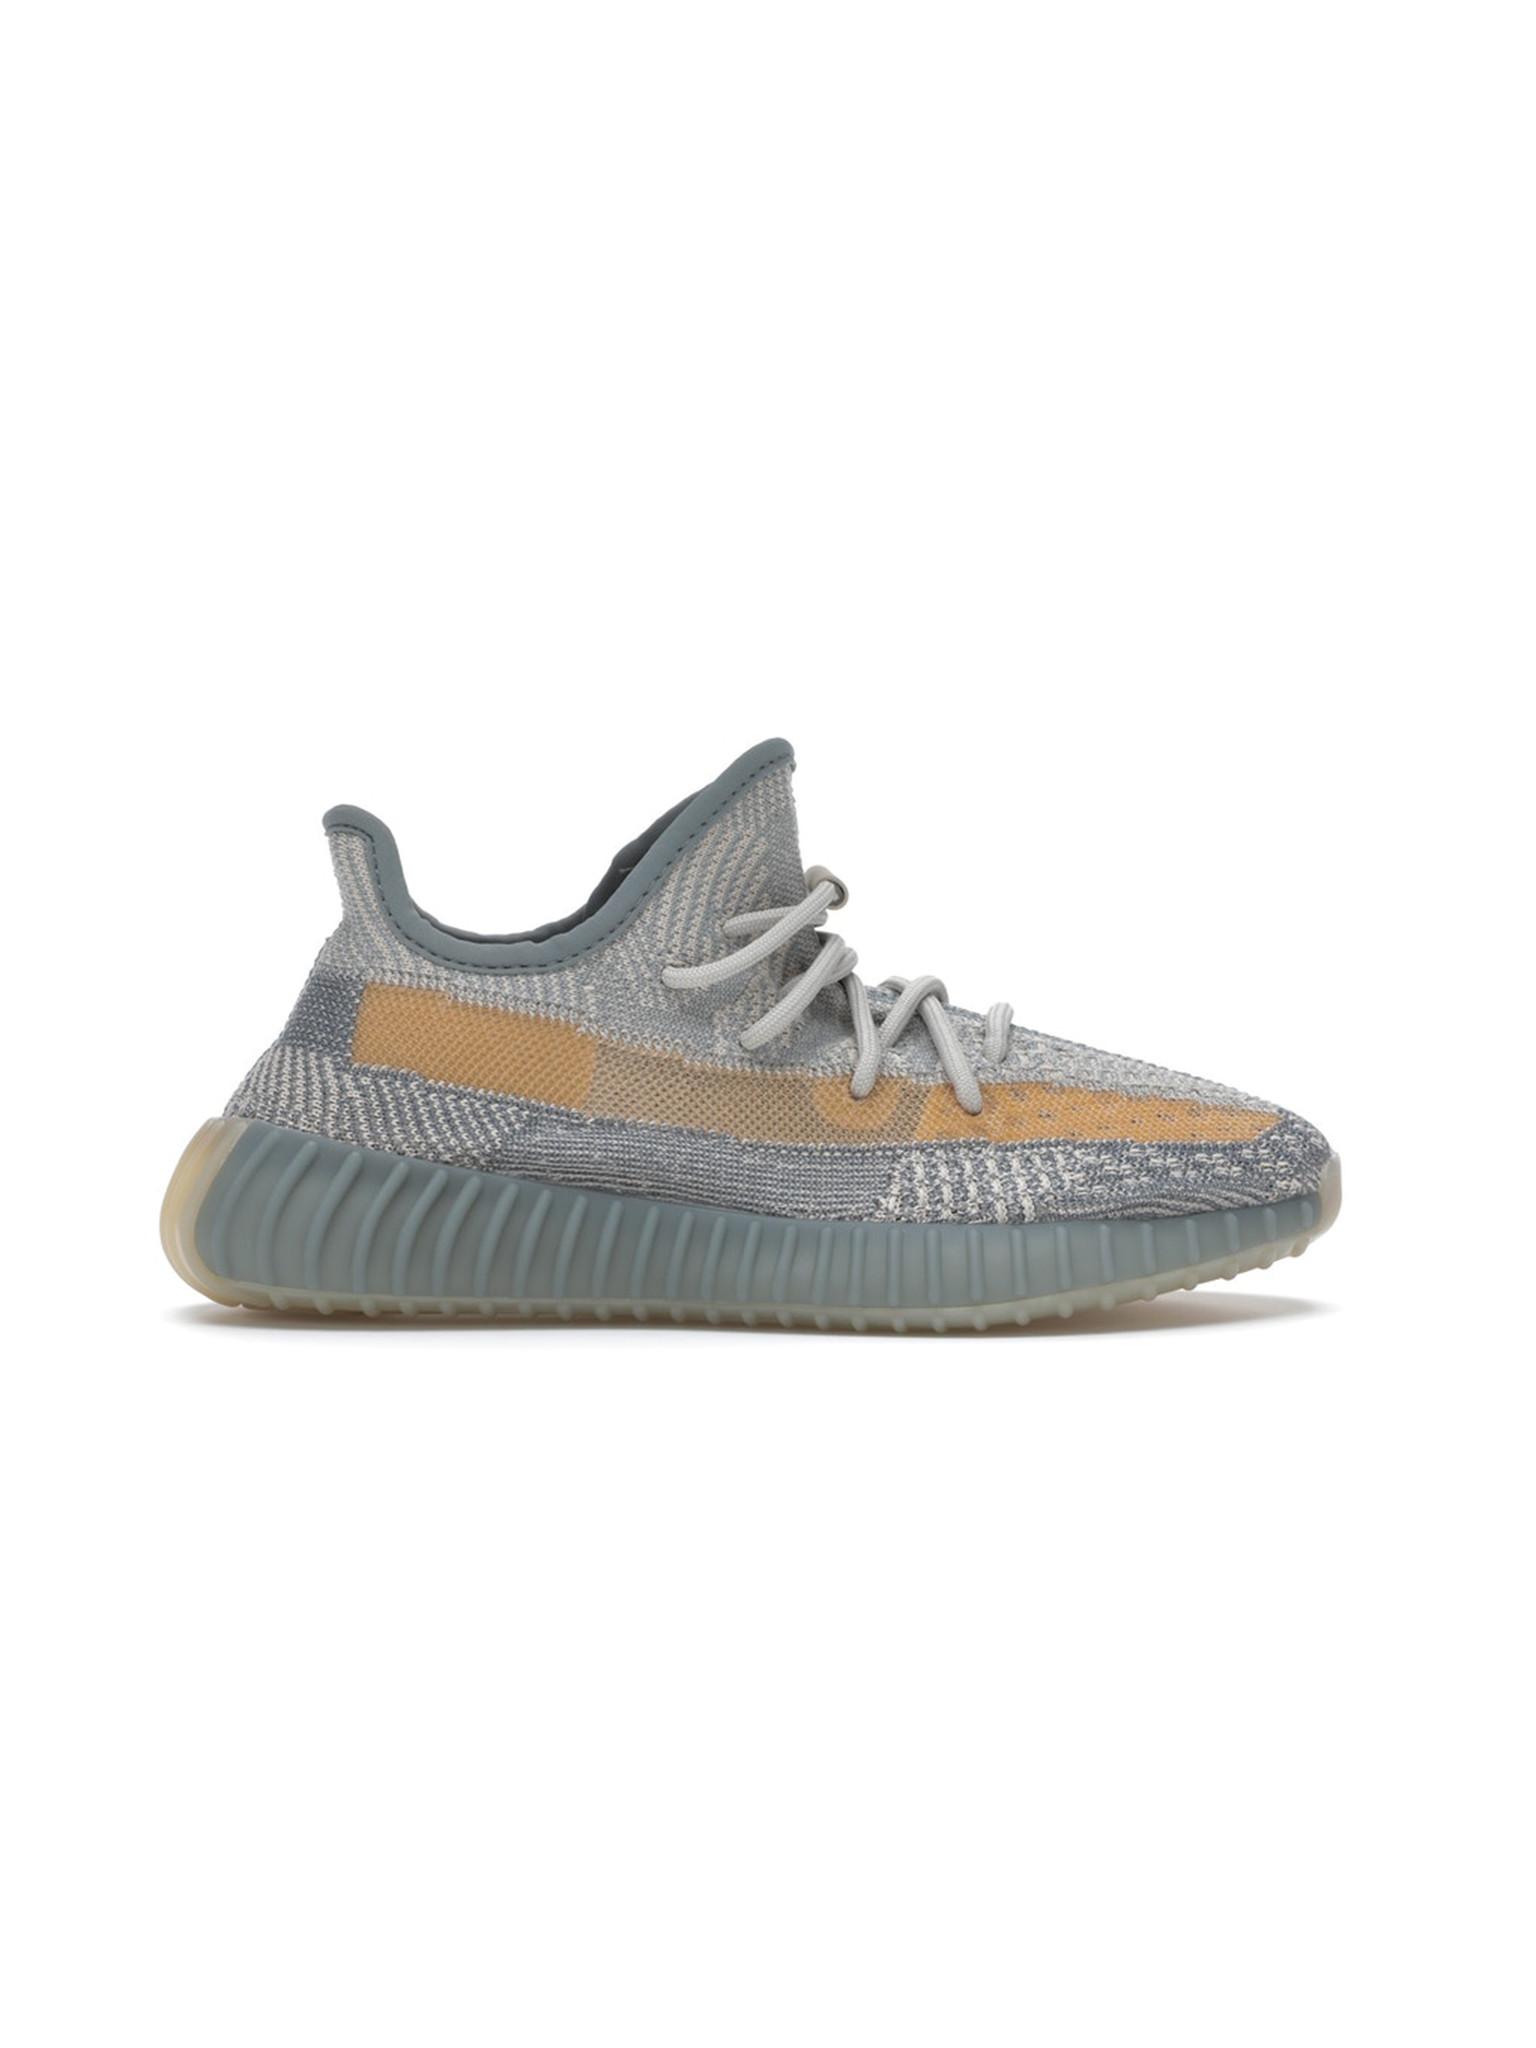 Yeezy Boost 350 V2 Israfil Sneakers